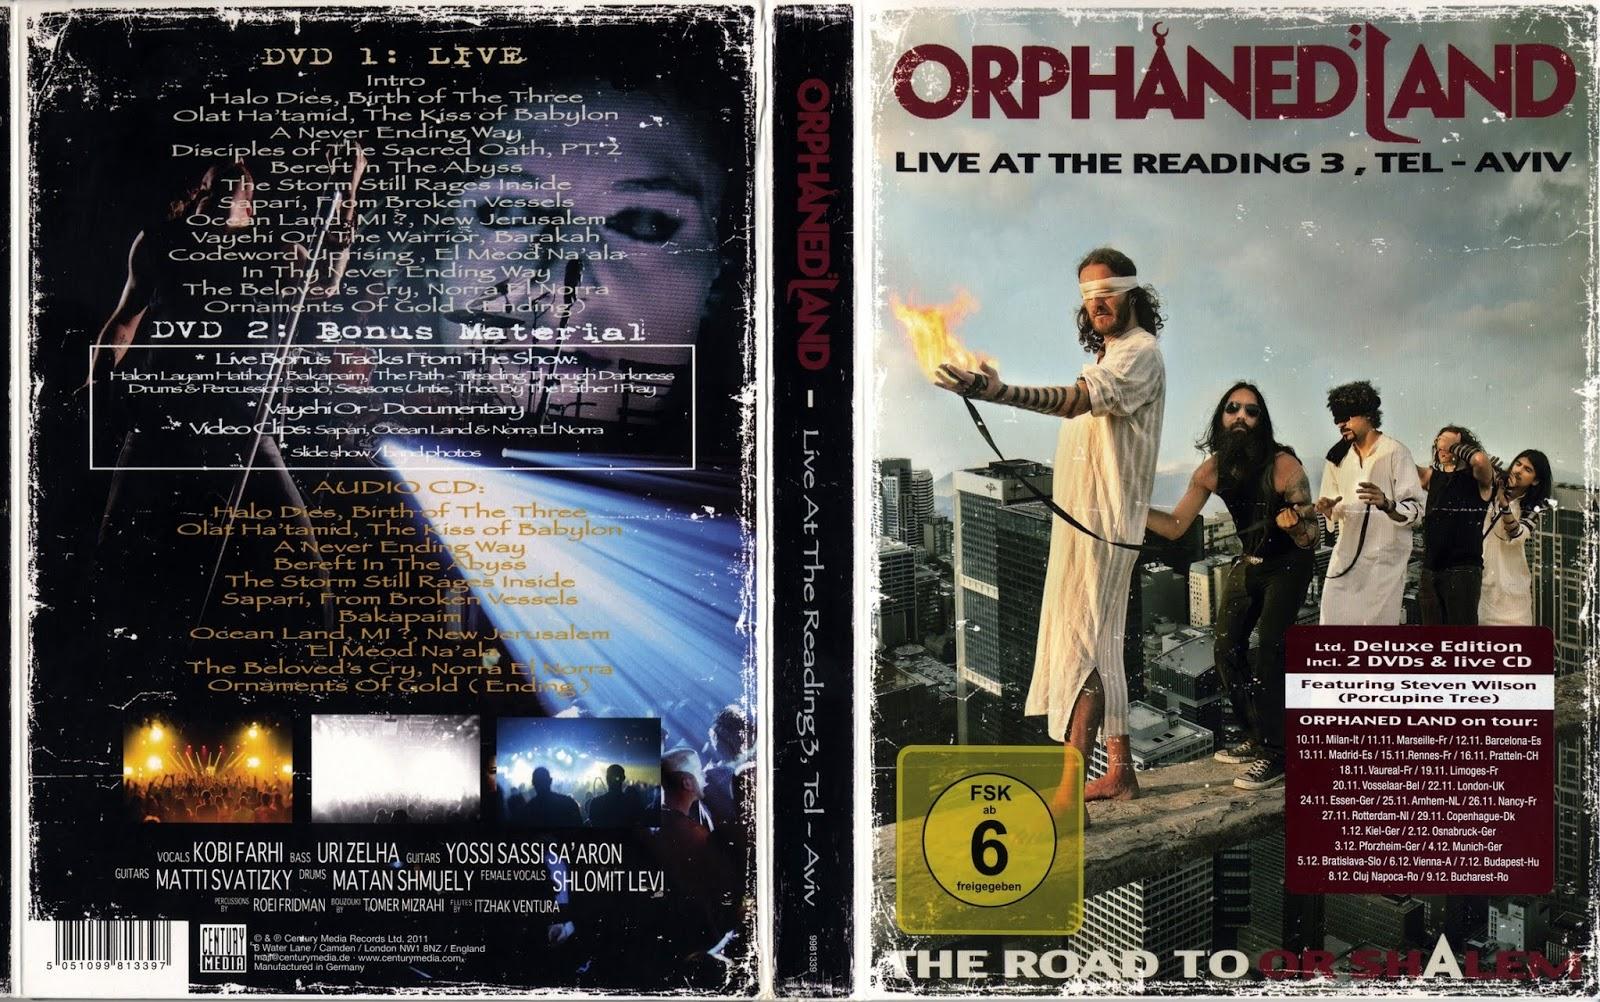 BAIXAR DVD TANKARD